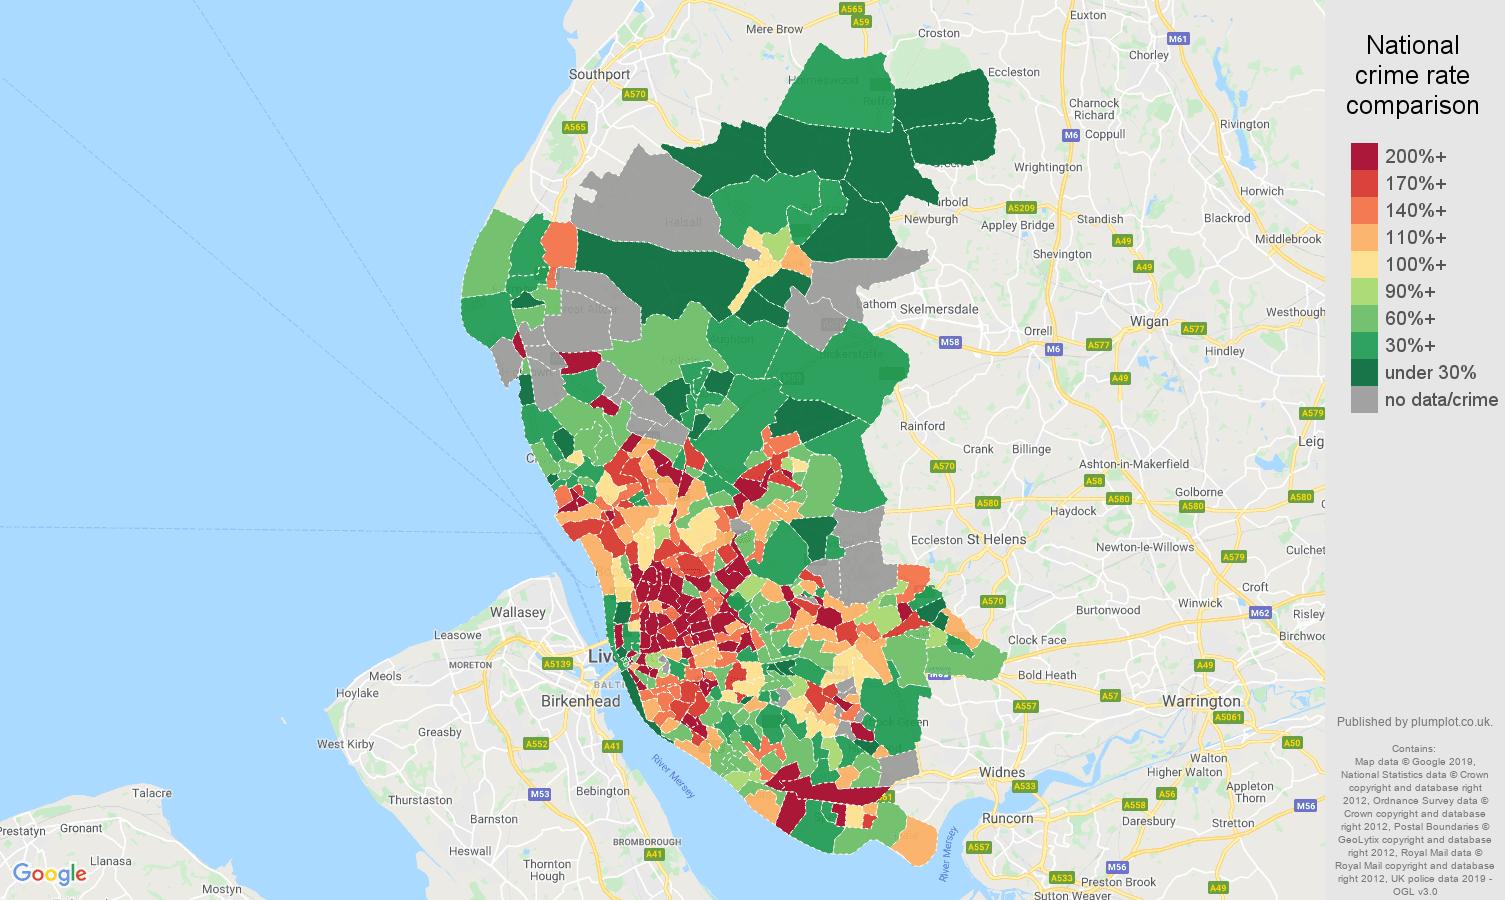 Liverpool public order crime rate comparison map